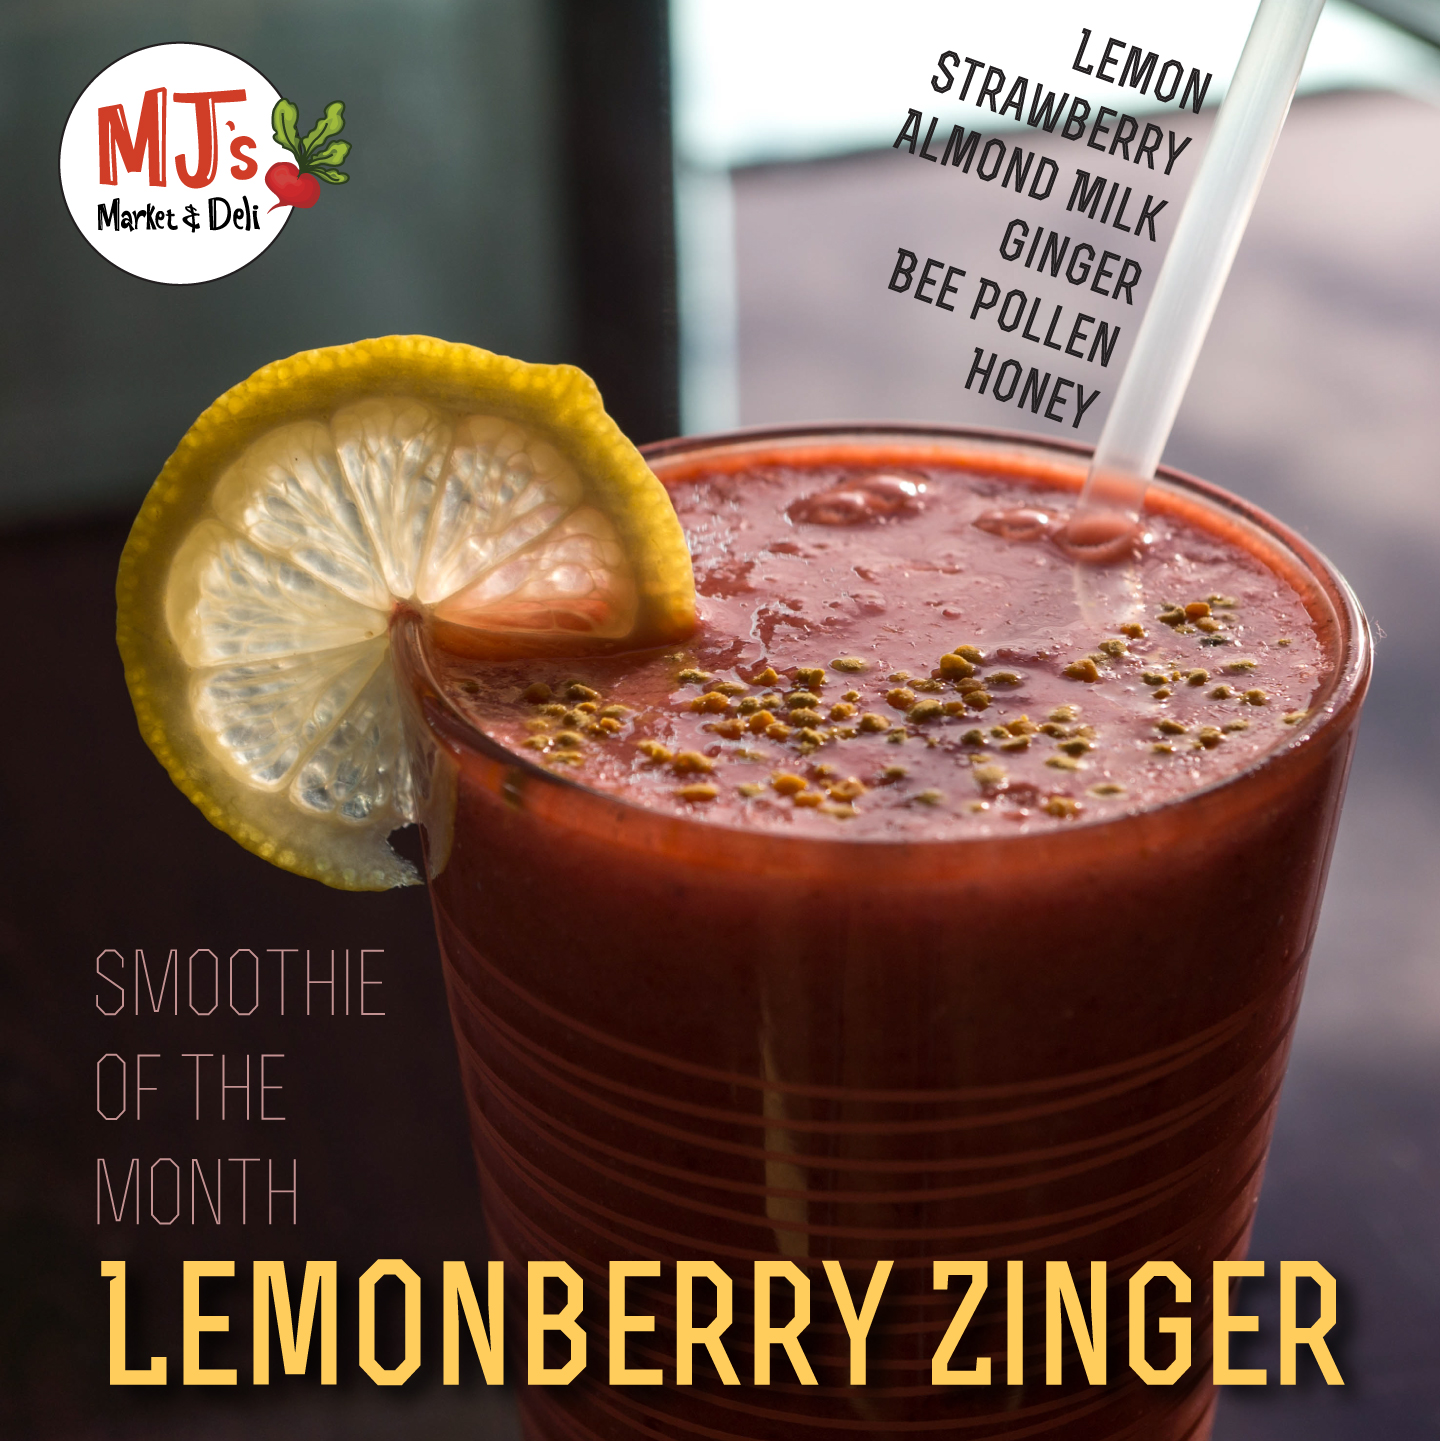 LemonberryZinger